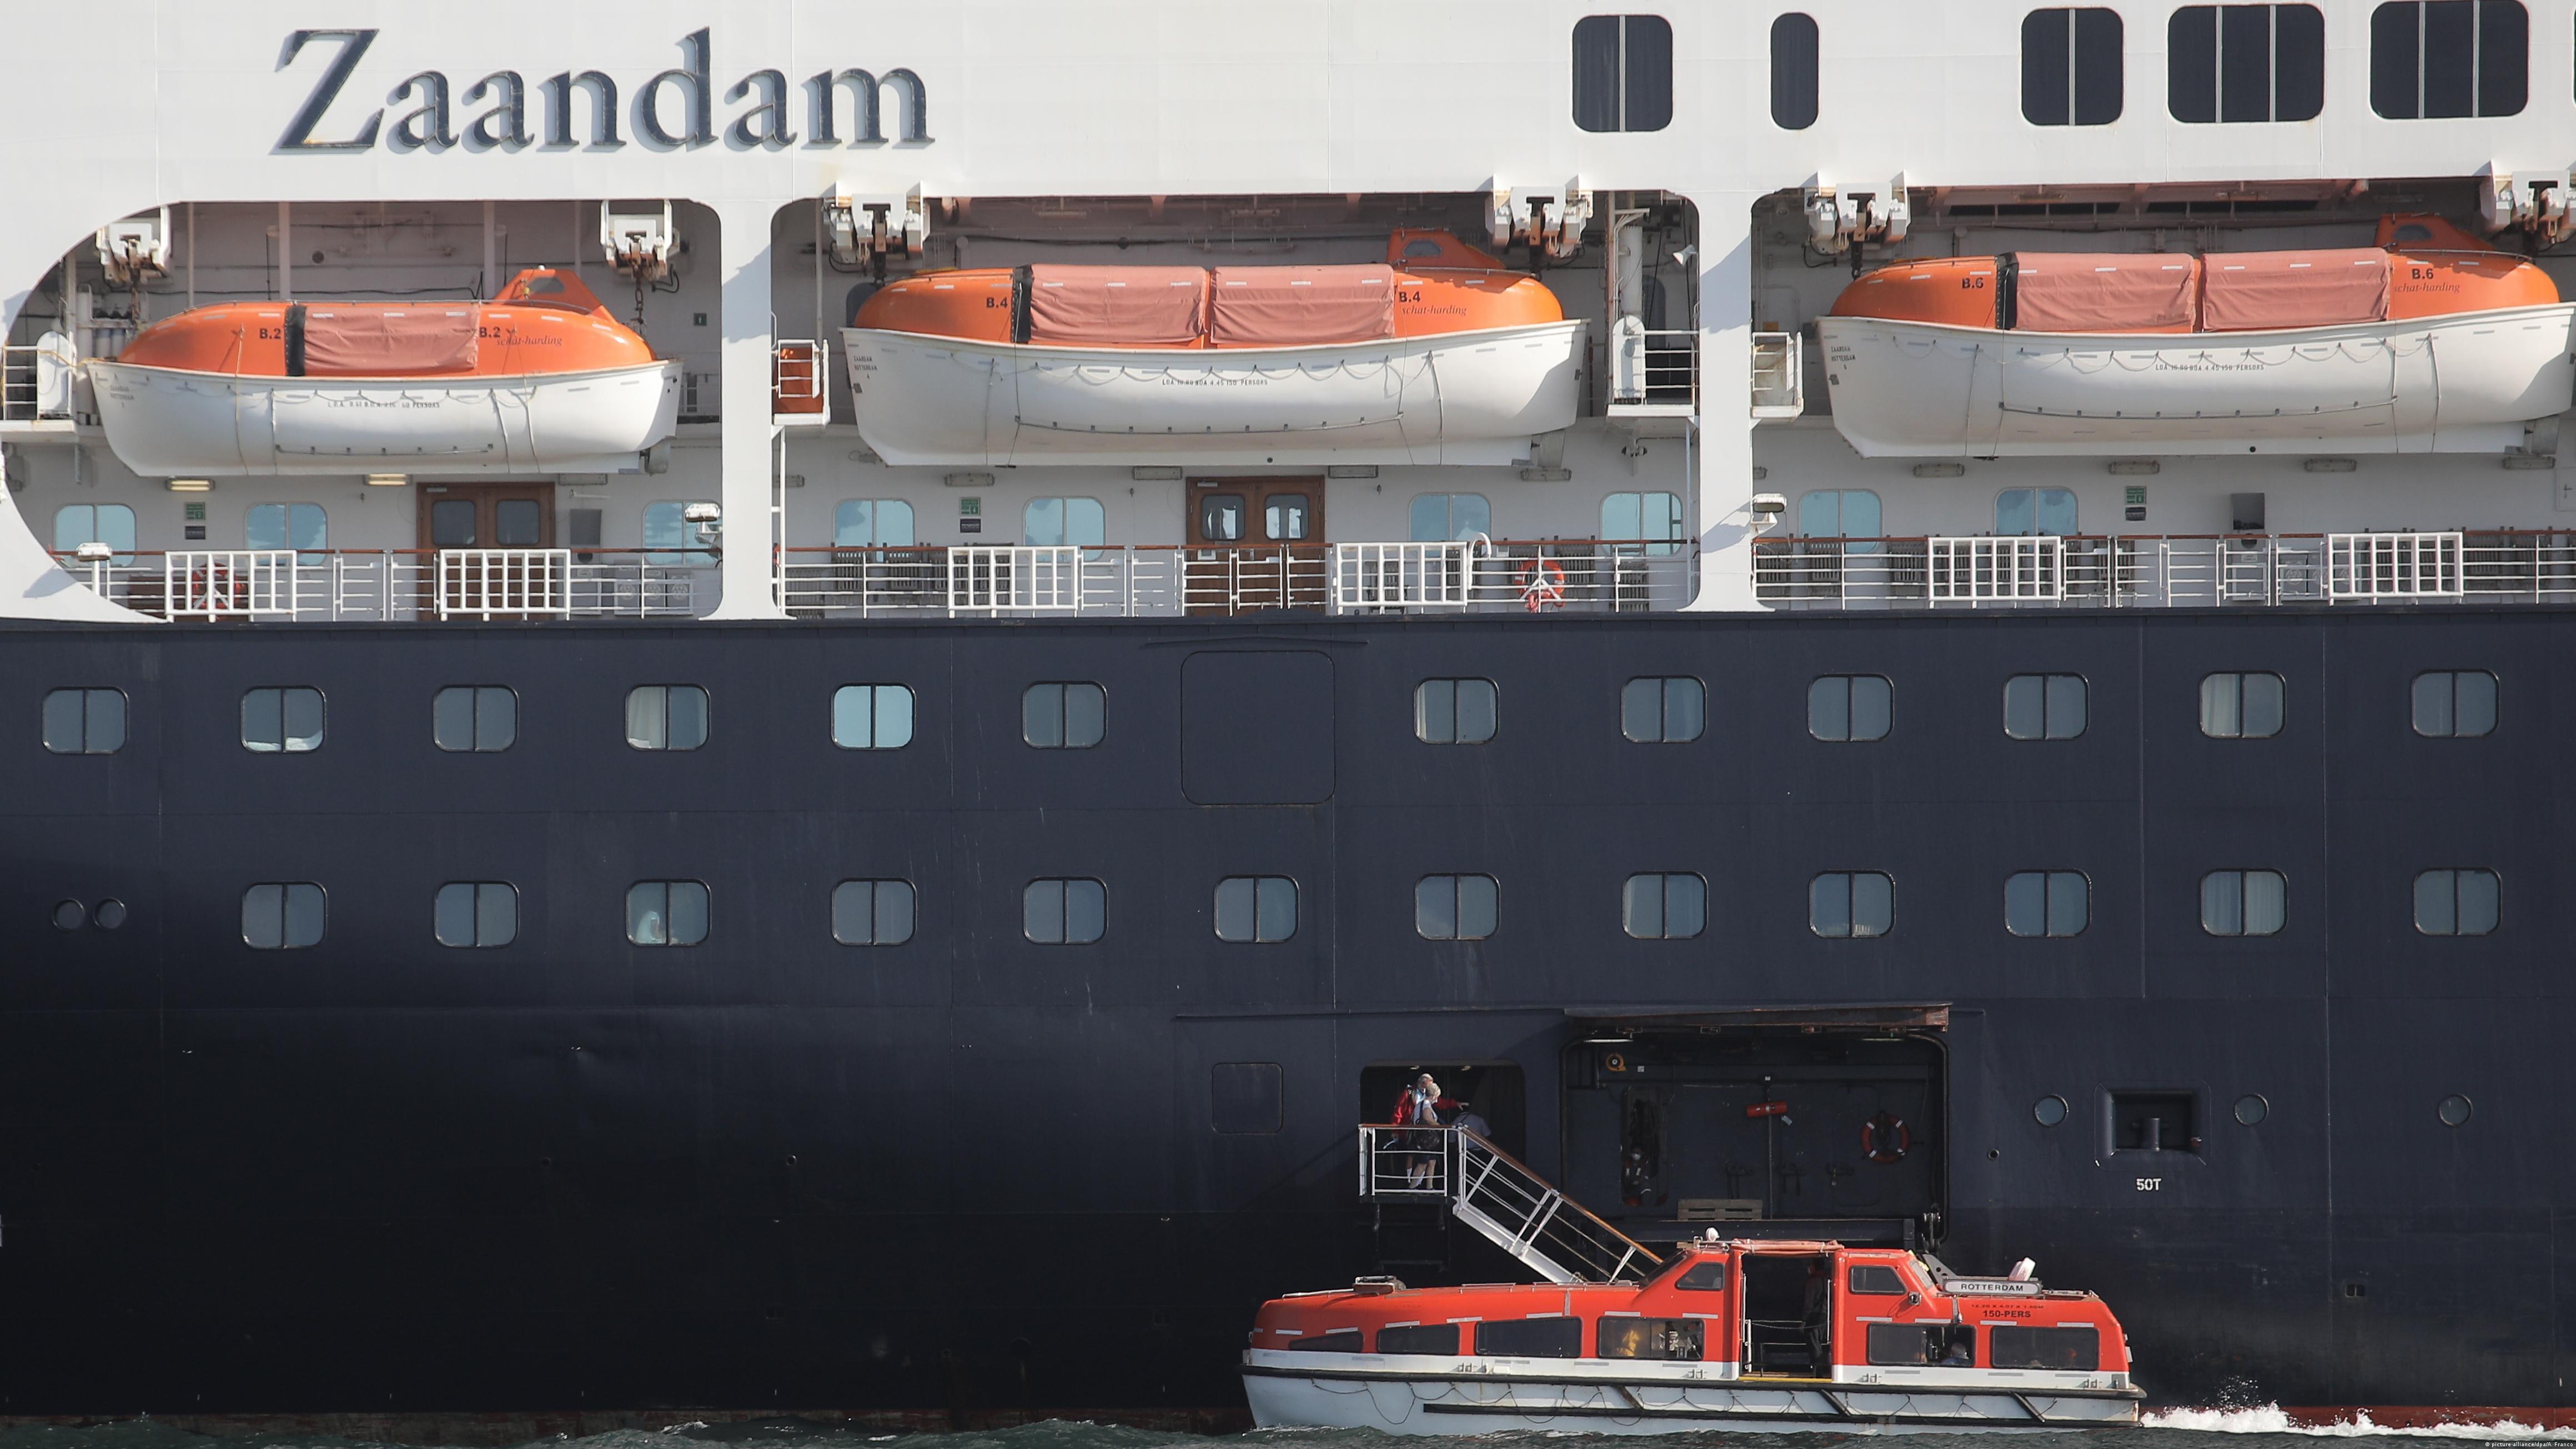 Coronafälle auf Kreuzfahrtschiff Zaandam (picture-alliance/dpa/A. Franco)